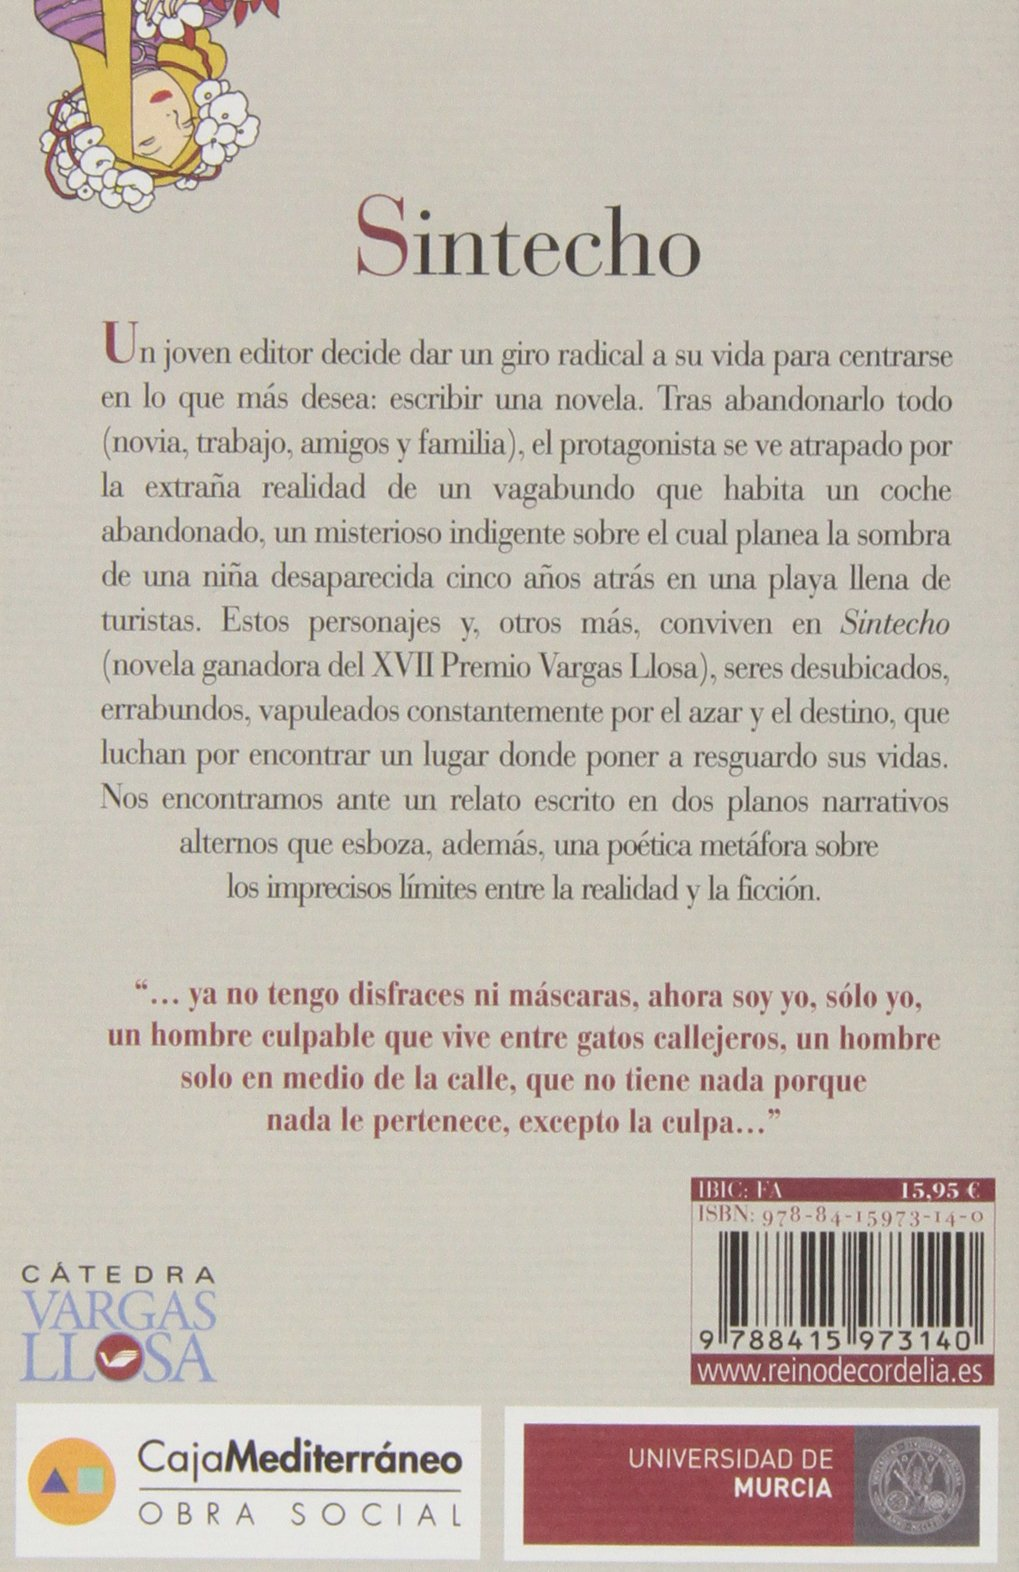 Sintecho: XVII Premio de Novela Mario Vargas Llosa: TORRES LOPEZ DE: 9788415973140: Amazon.com: Books